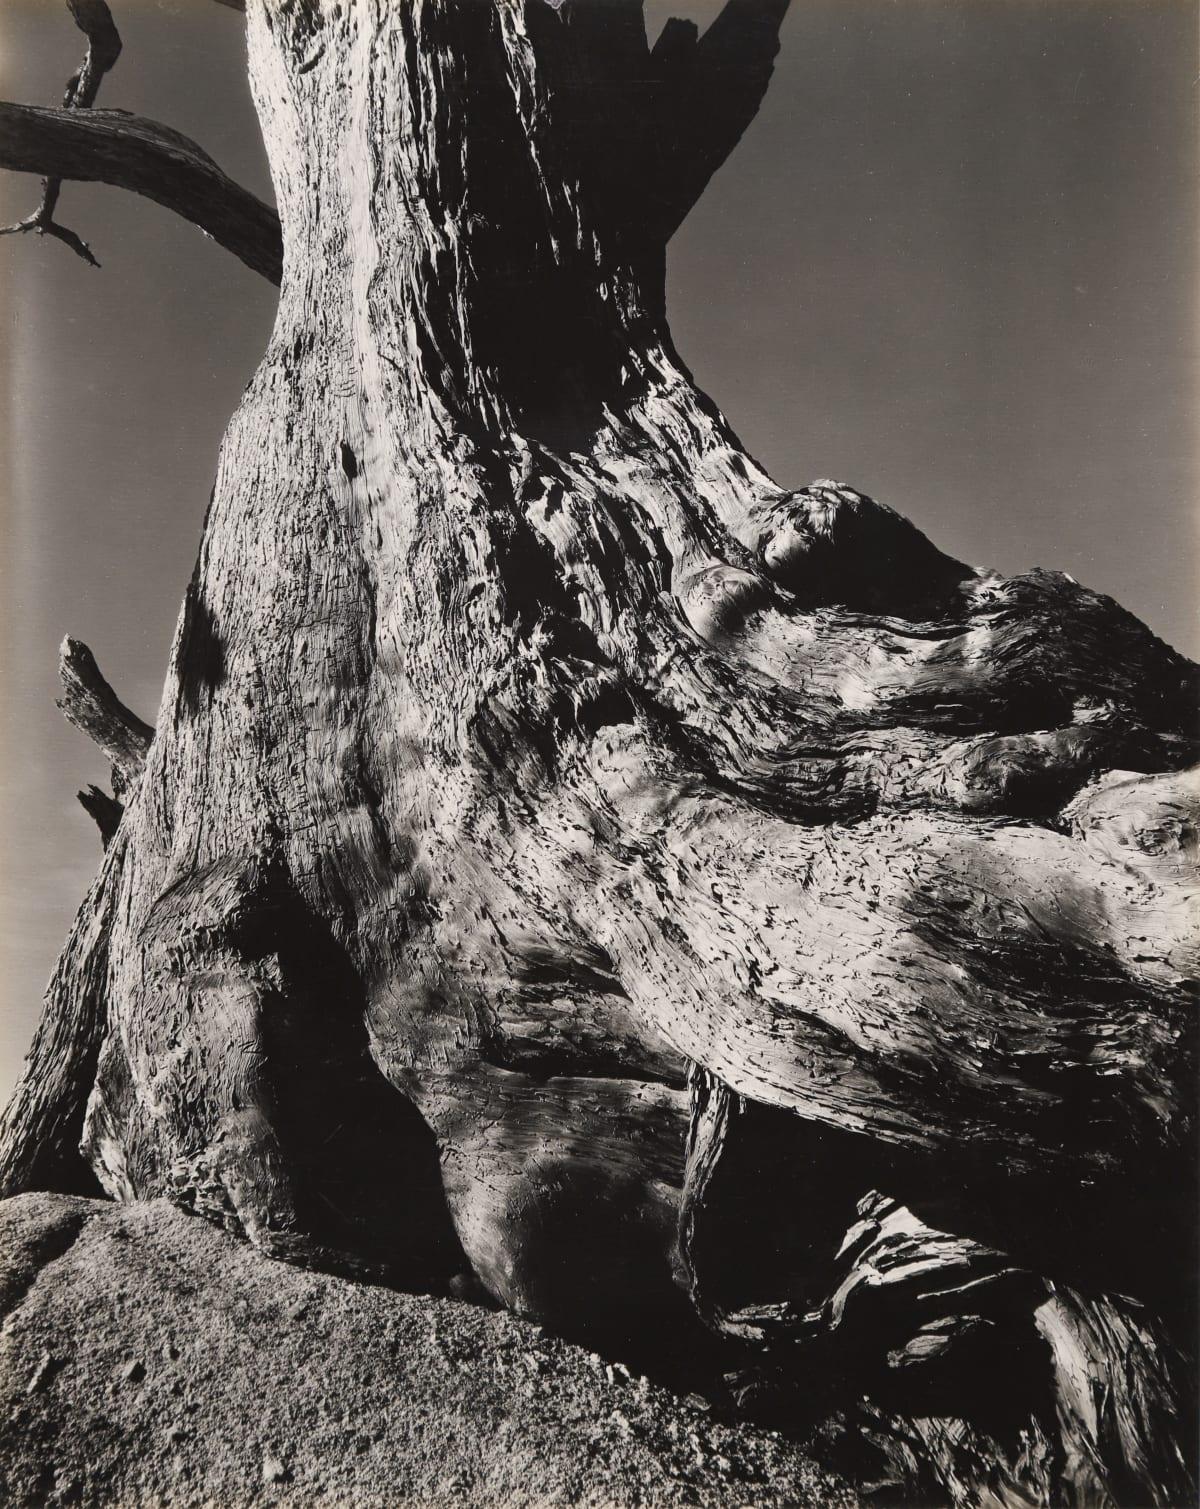 Edward Weston, Monterey Cypress, Pebble Beach, 1932